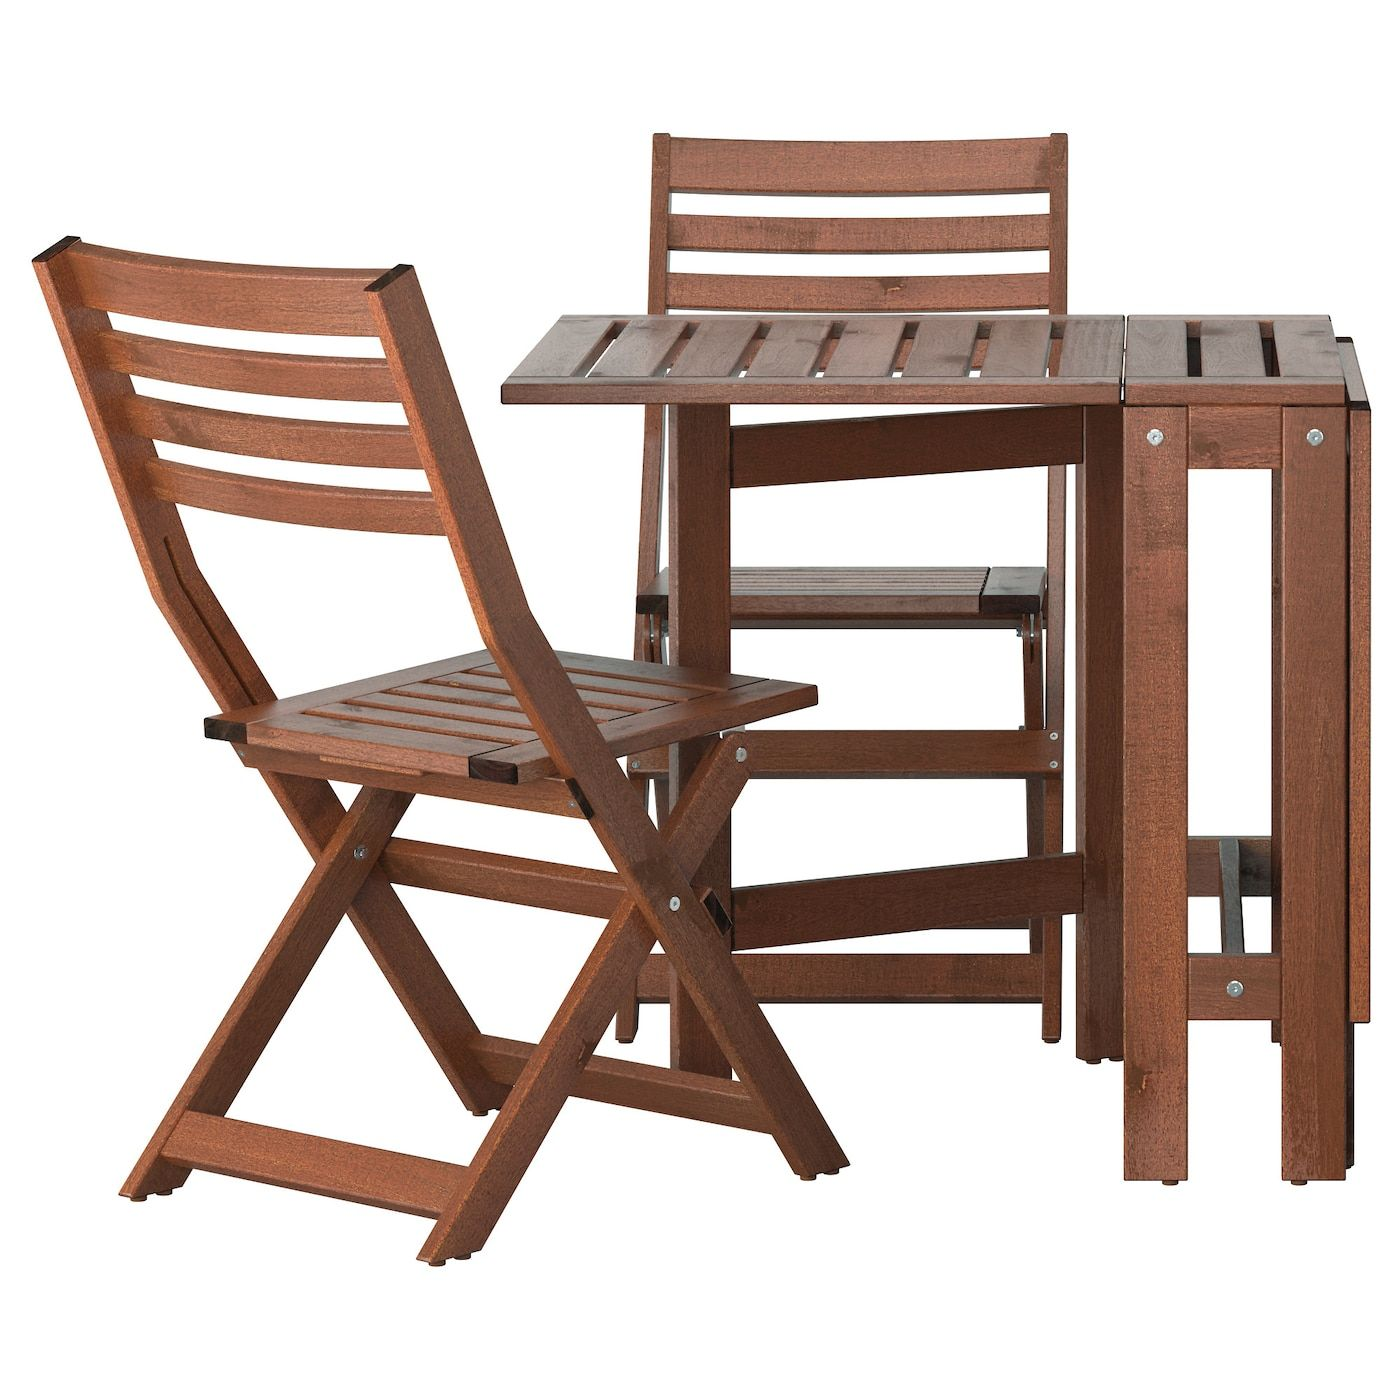 Ikea Tavoli Da Esterno.Ikea Tavoli Da Esterno Ripiegabili